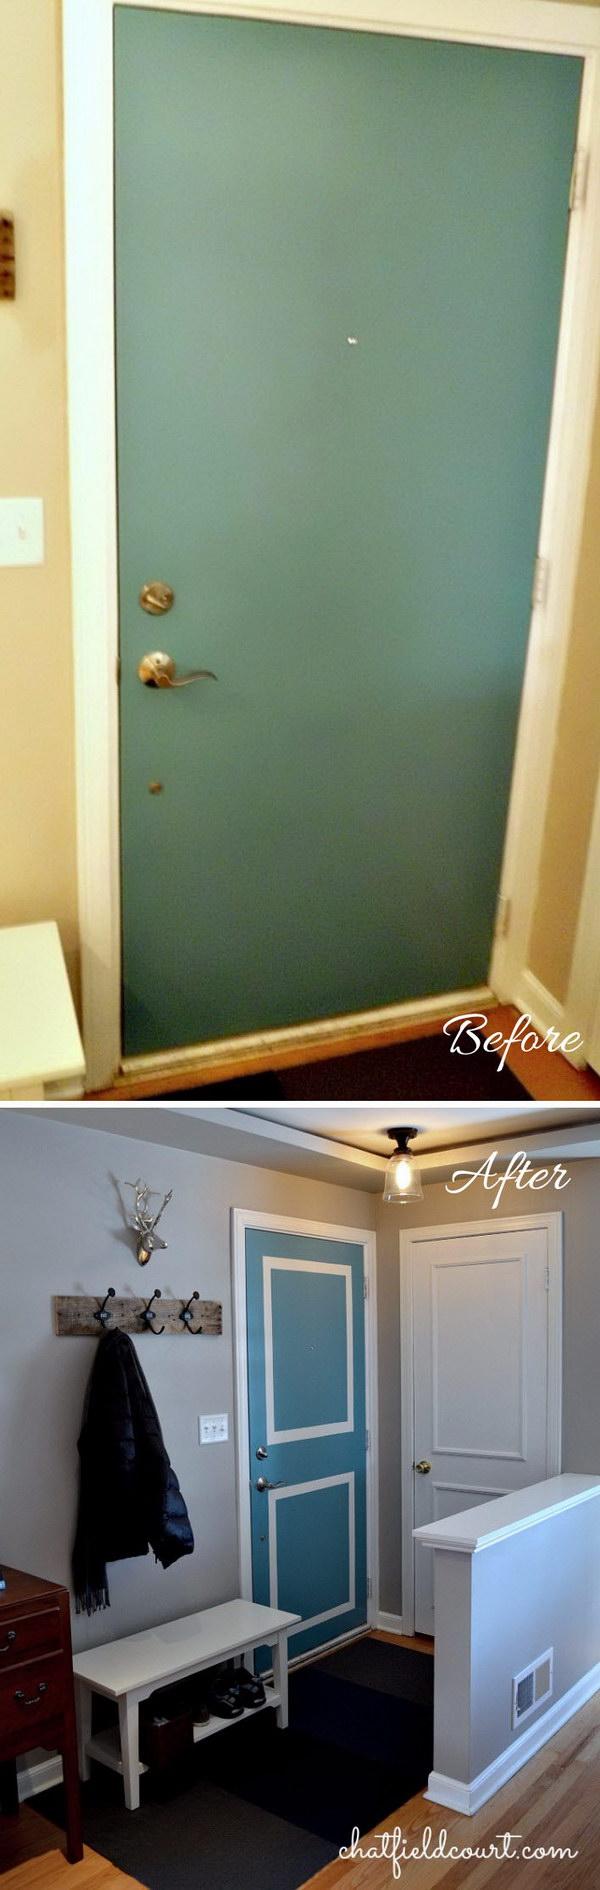 30 entryway makeover diy ideas tutorials - 30+ DIY Ideas to Give a Makeover to a Your Entryway